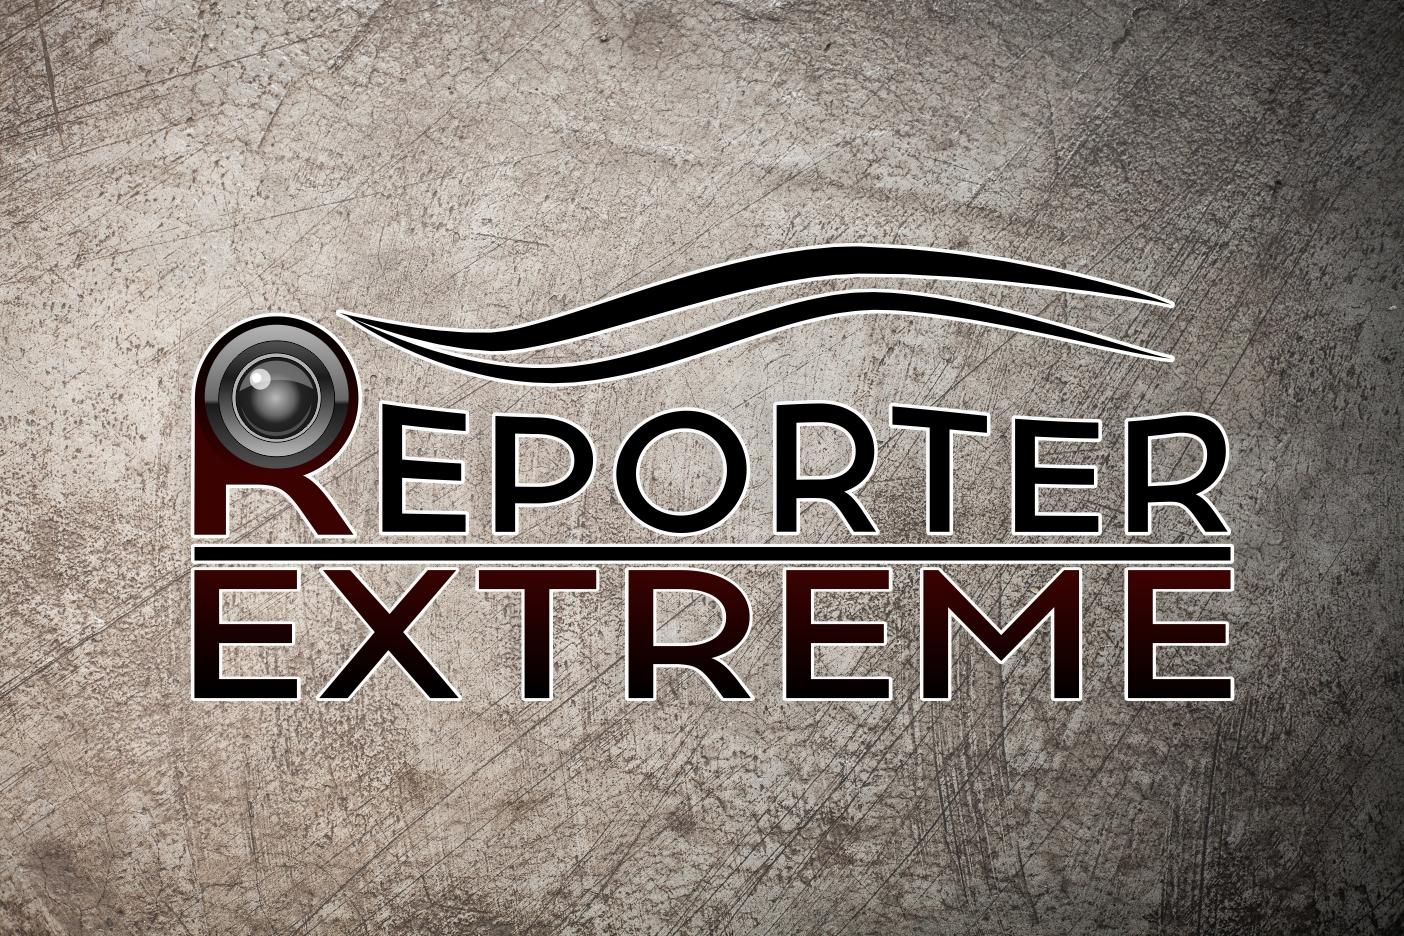 Логотип для экстрим фотографа.  фото f_8755a520ff7d43c1.jpg